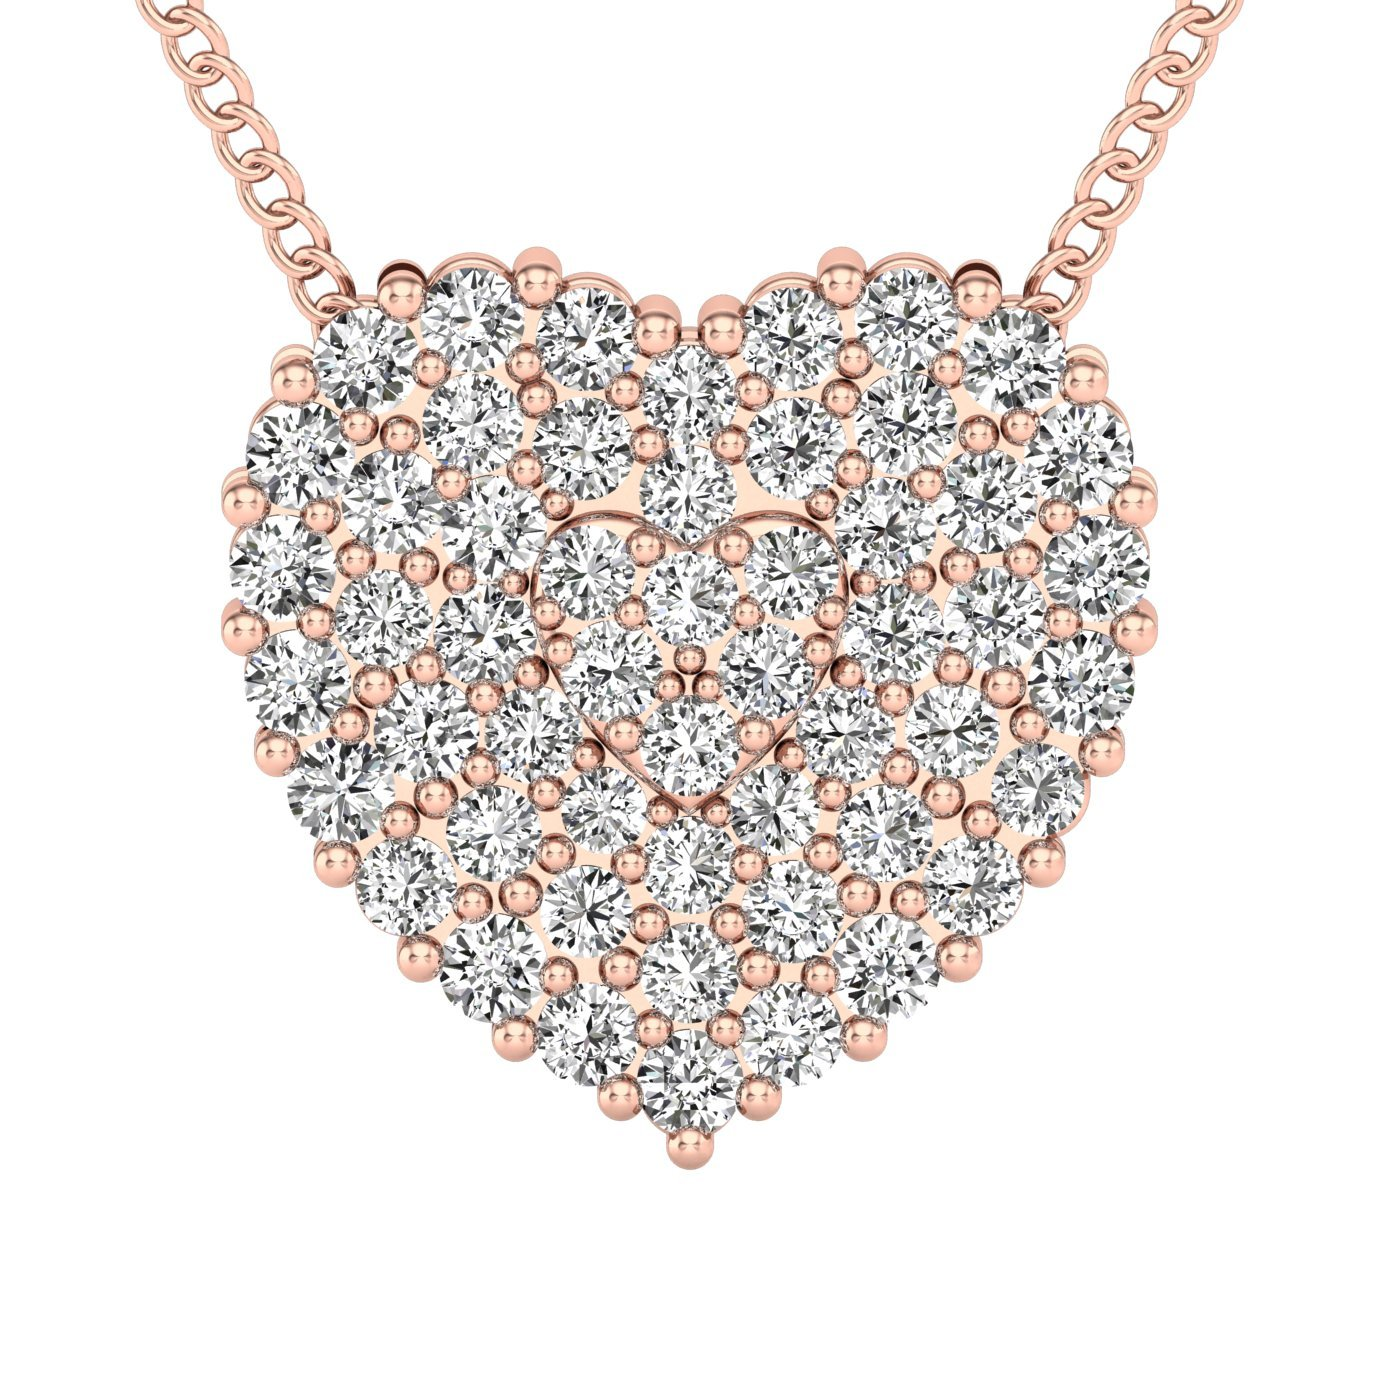 71040e6a7f6 Amazon.com: Heart Diamonds Pendant with Necklace- Round Diamonds ...